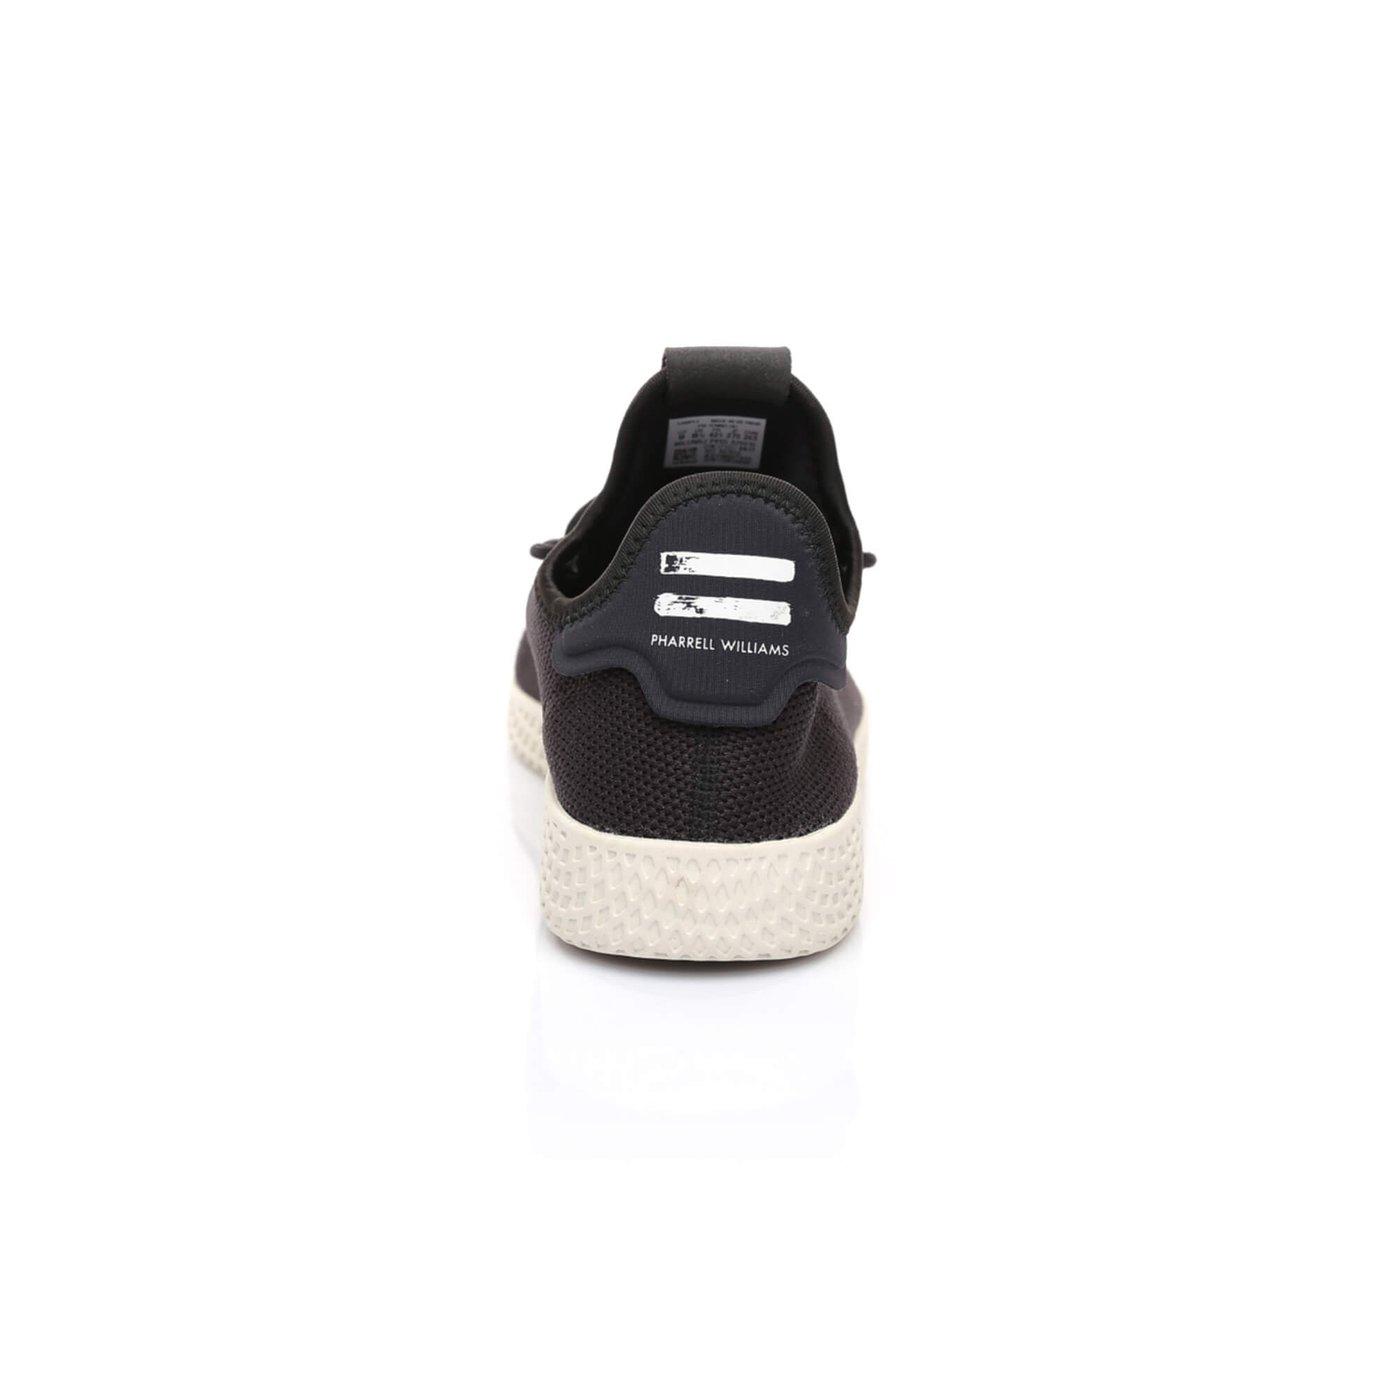 adidas Tennis Hu x Pharrell Williams Unisex Siyah Spor Ayakkabı